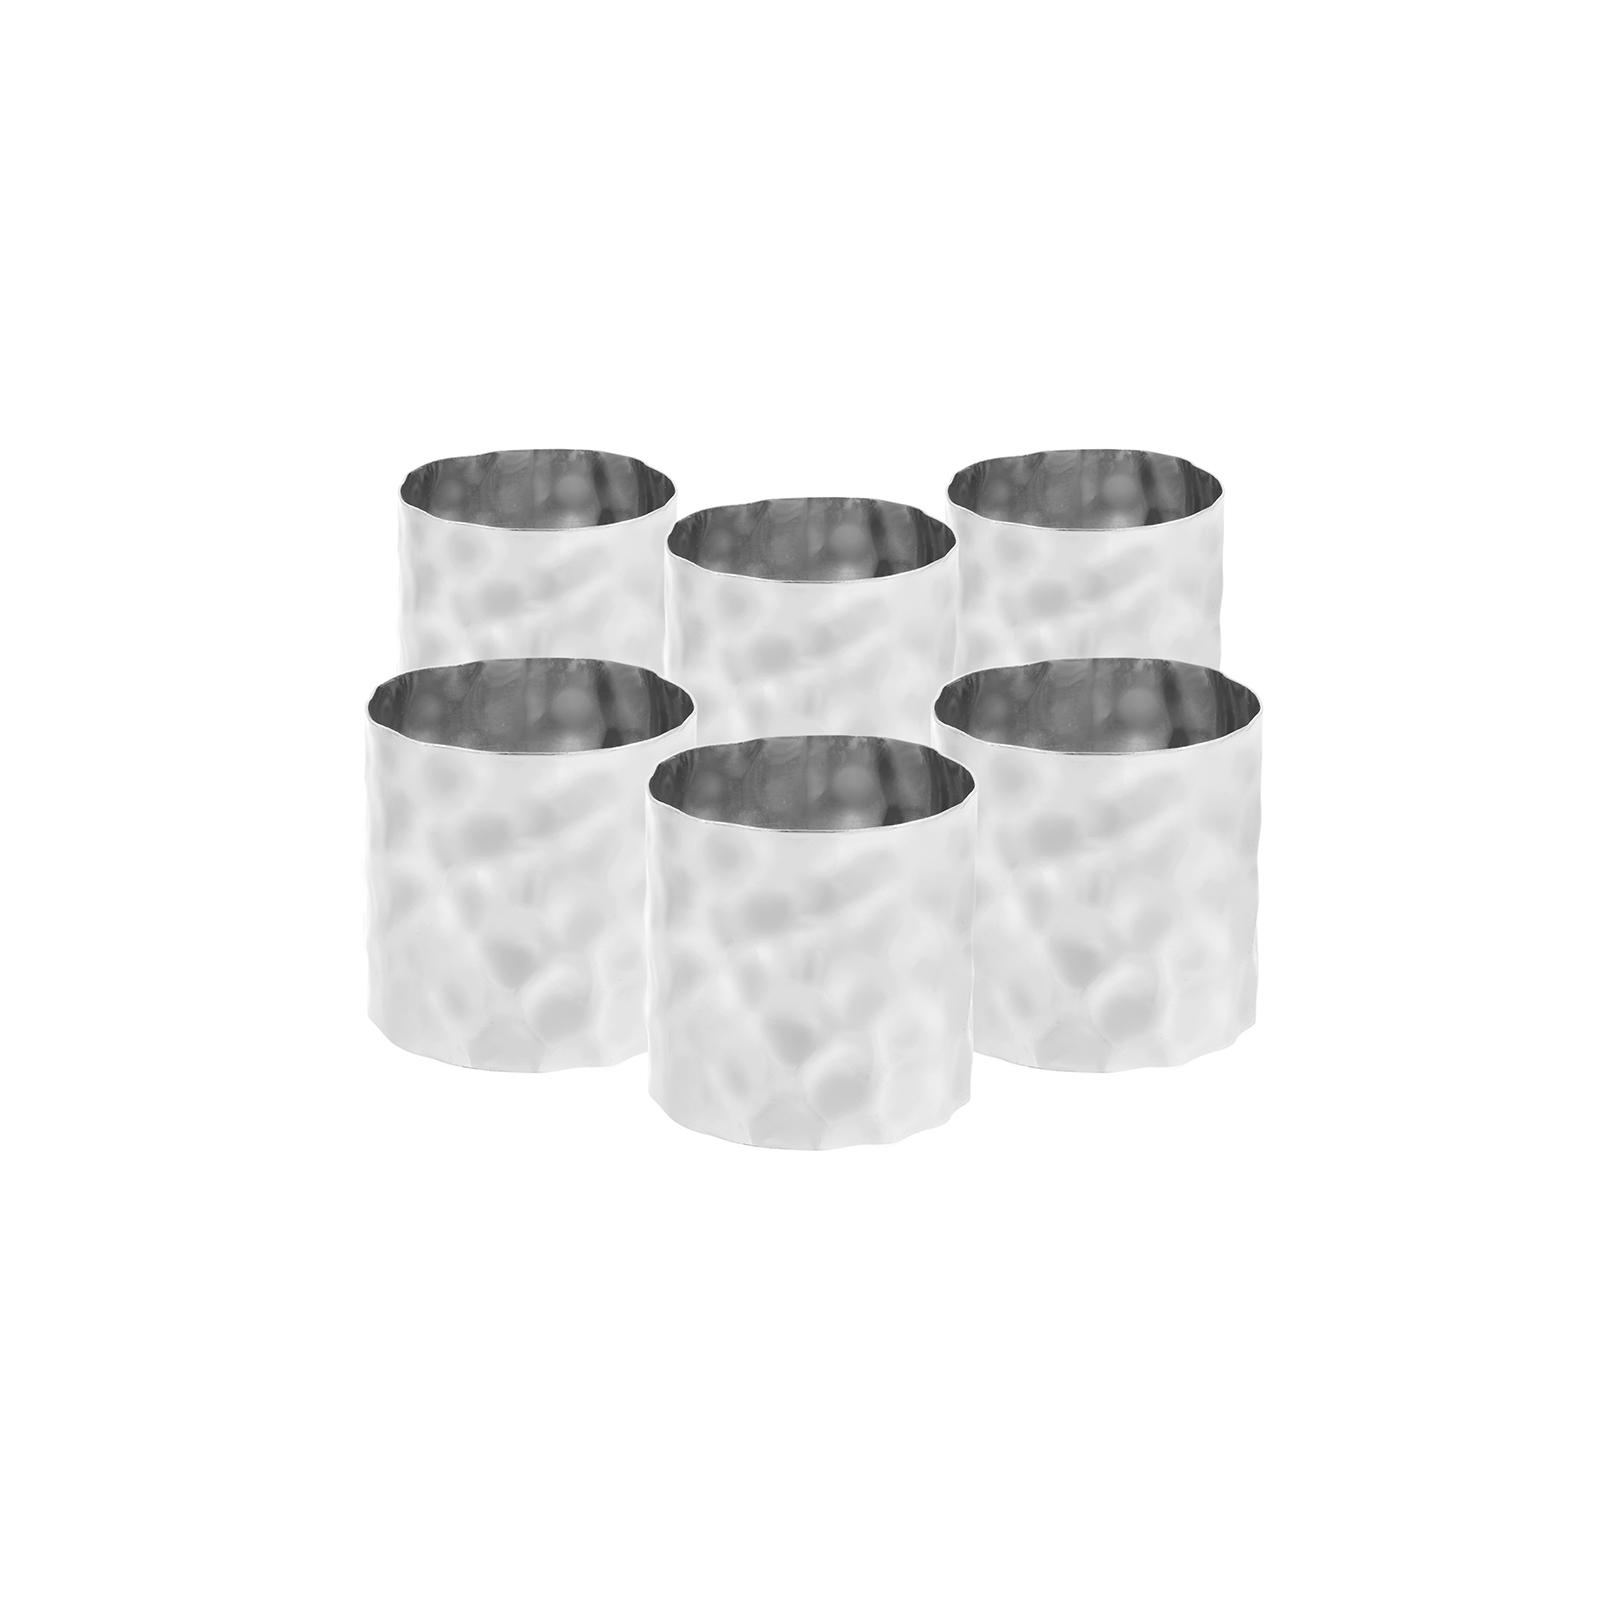 Karaca Home Moroc Peçete Yüzüğü 6'lı Rose Gümüş 4cm